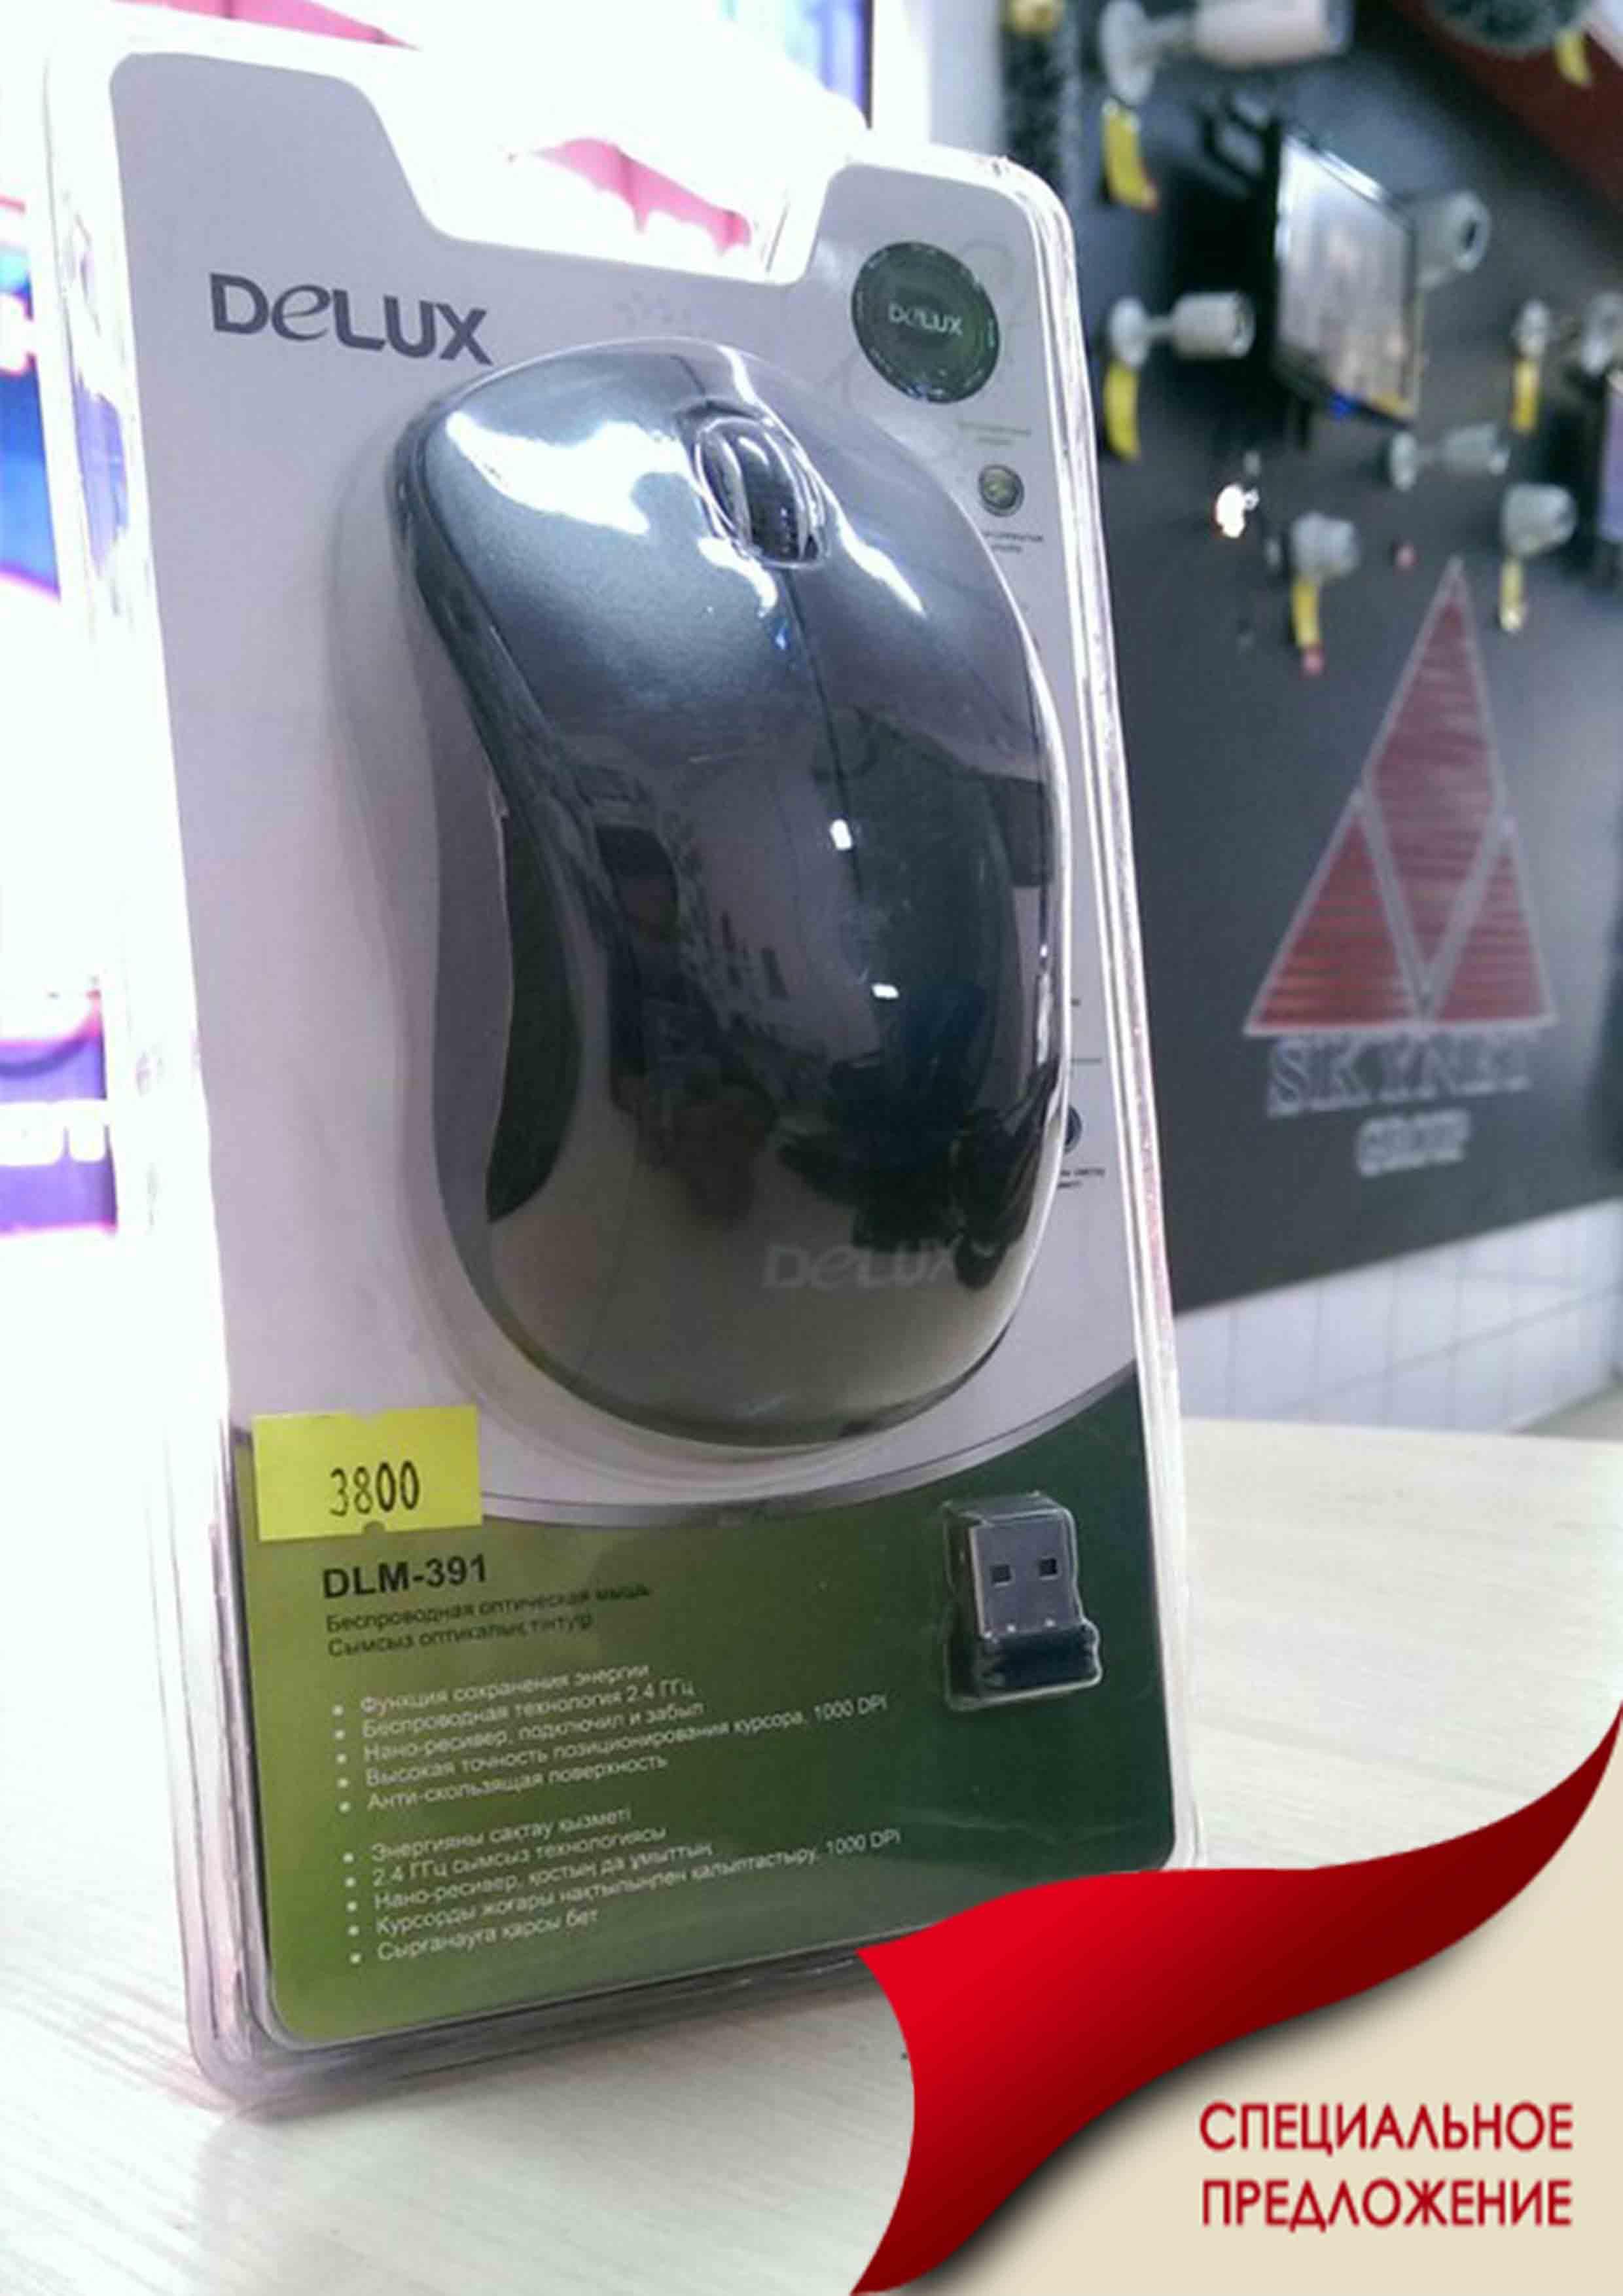 Беспроводная мышка Delux DLM-391